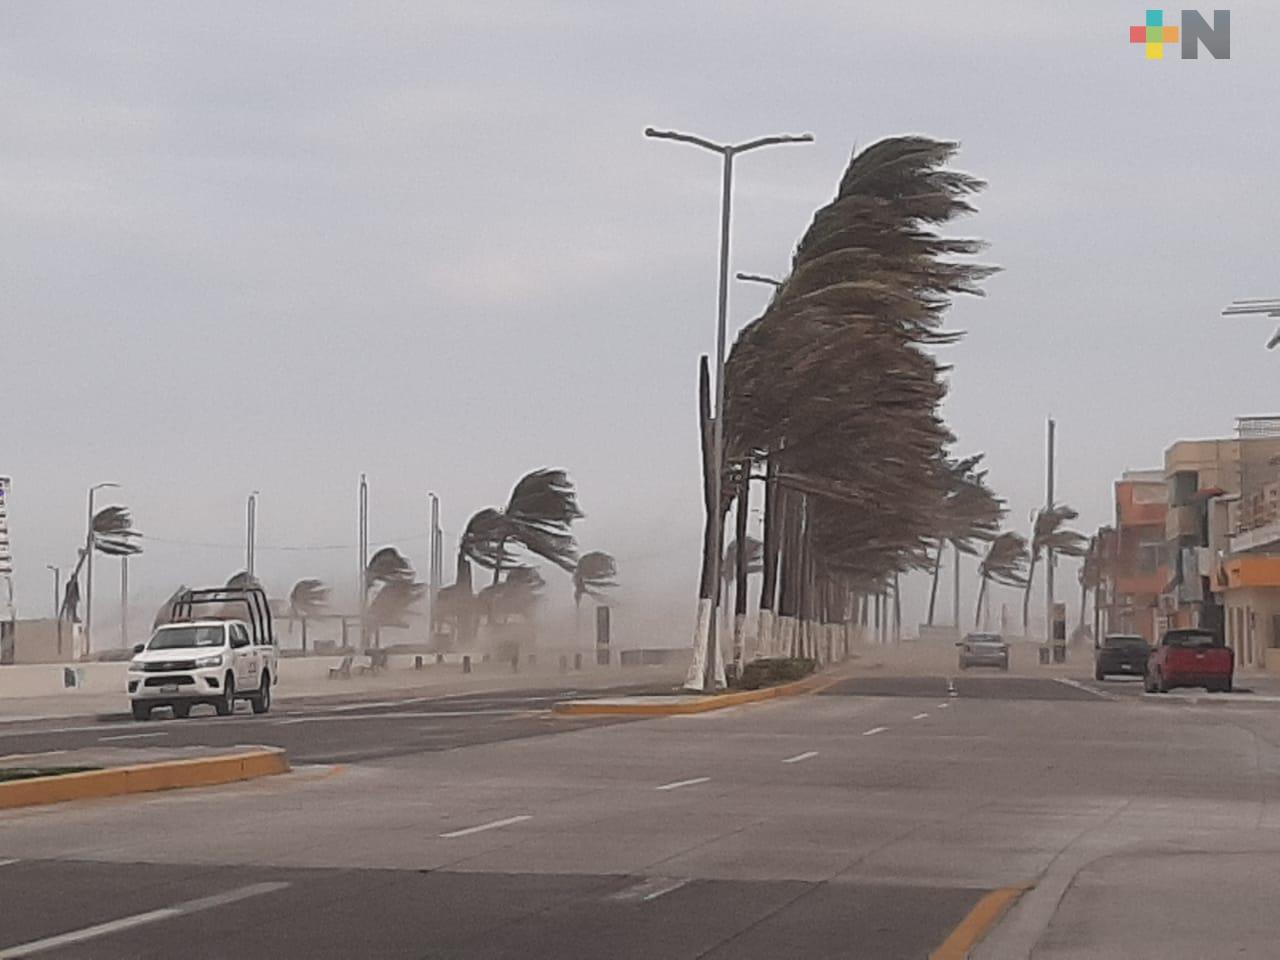 PC de Veracruz exhorta a tomar medidas de precaución ante Norte pronosticado